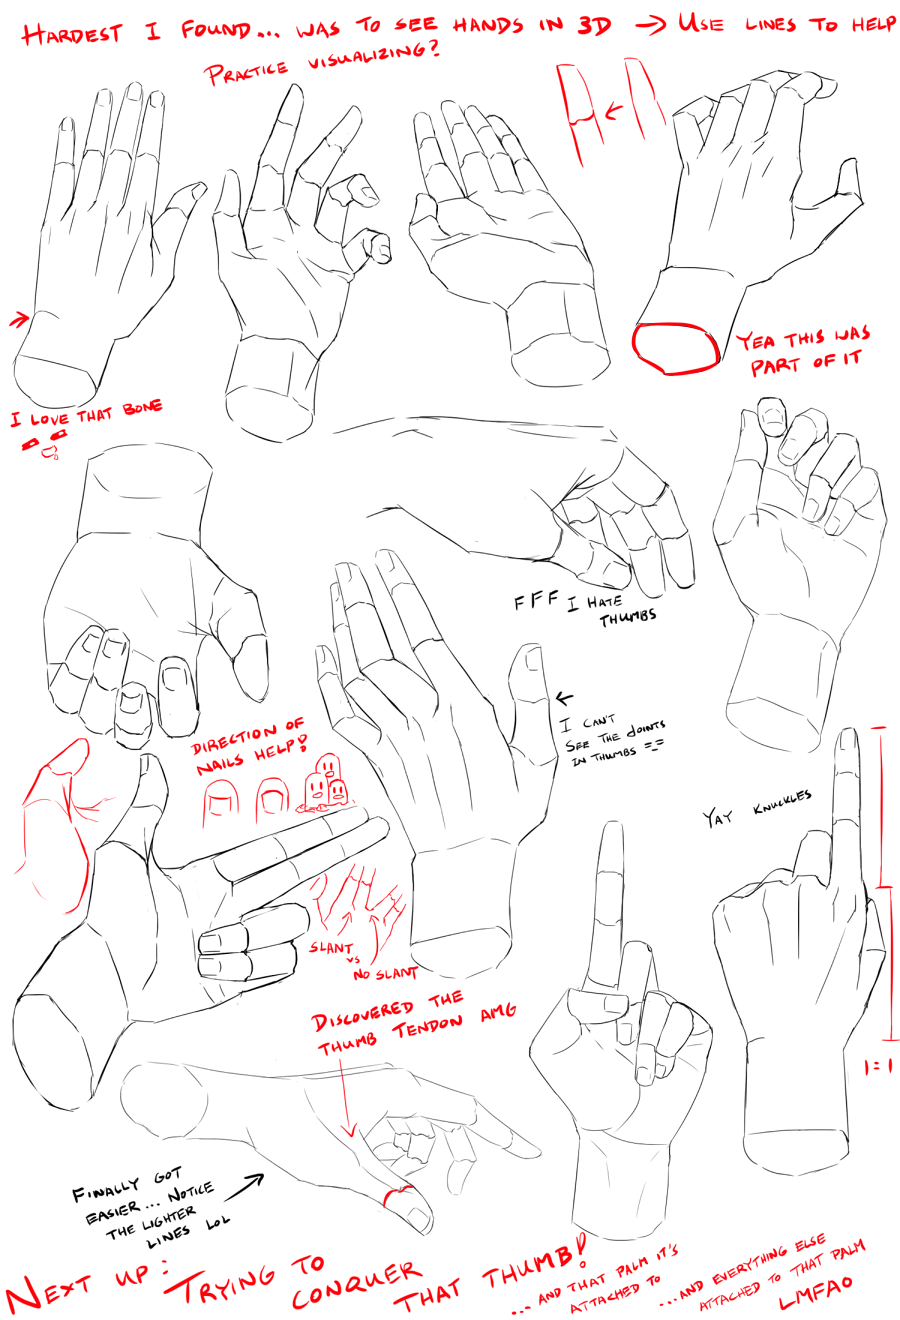 Hand Study 1 by UGotRektHard